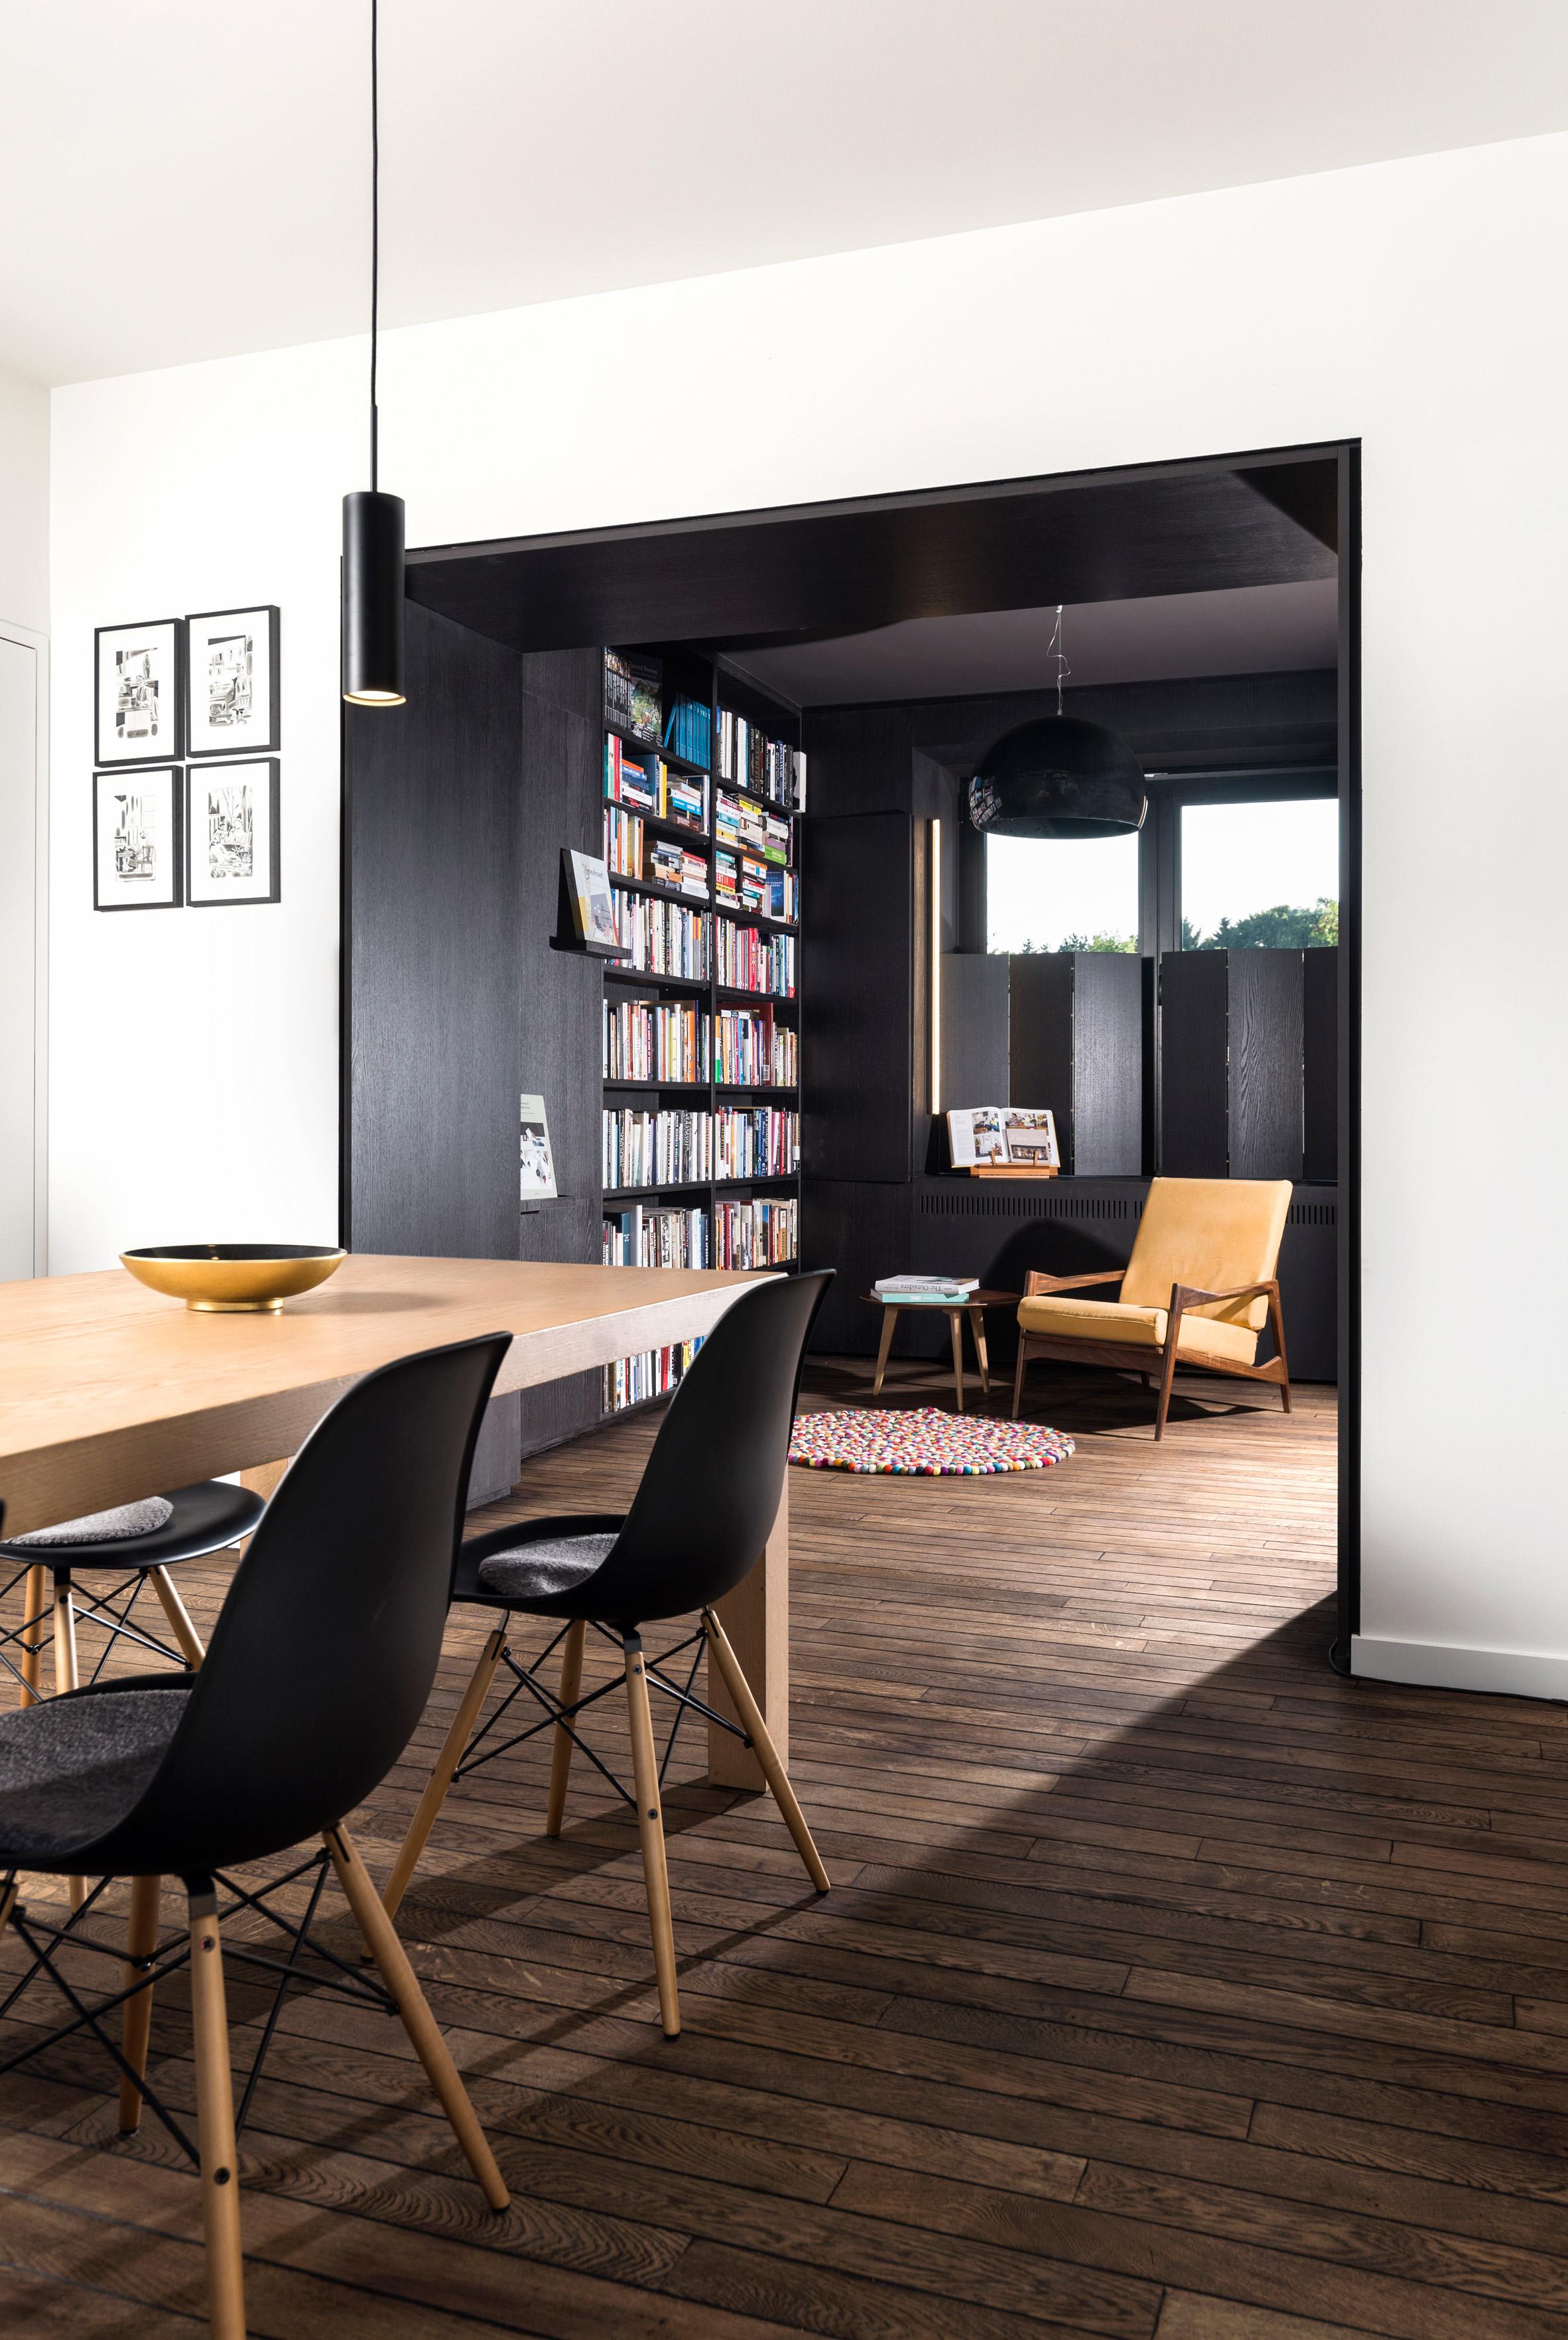 architecture-semi-detached-house-with-an-outdoor-areadesign-studia-interiors-osnovadesign-osnova-poltava_07